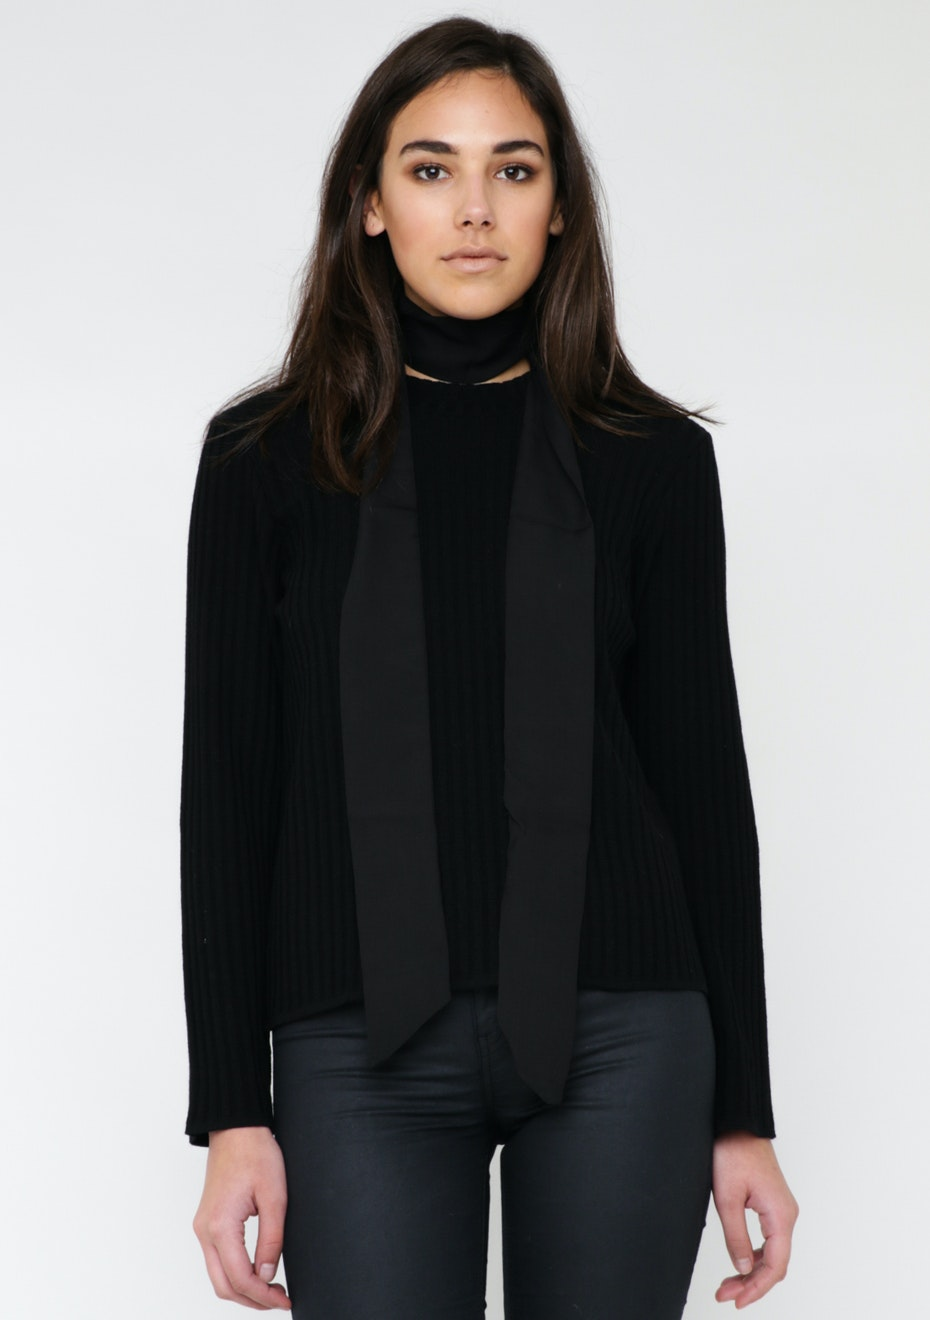 Tie Scarf - Black